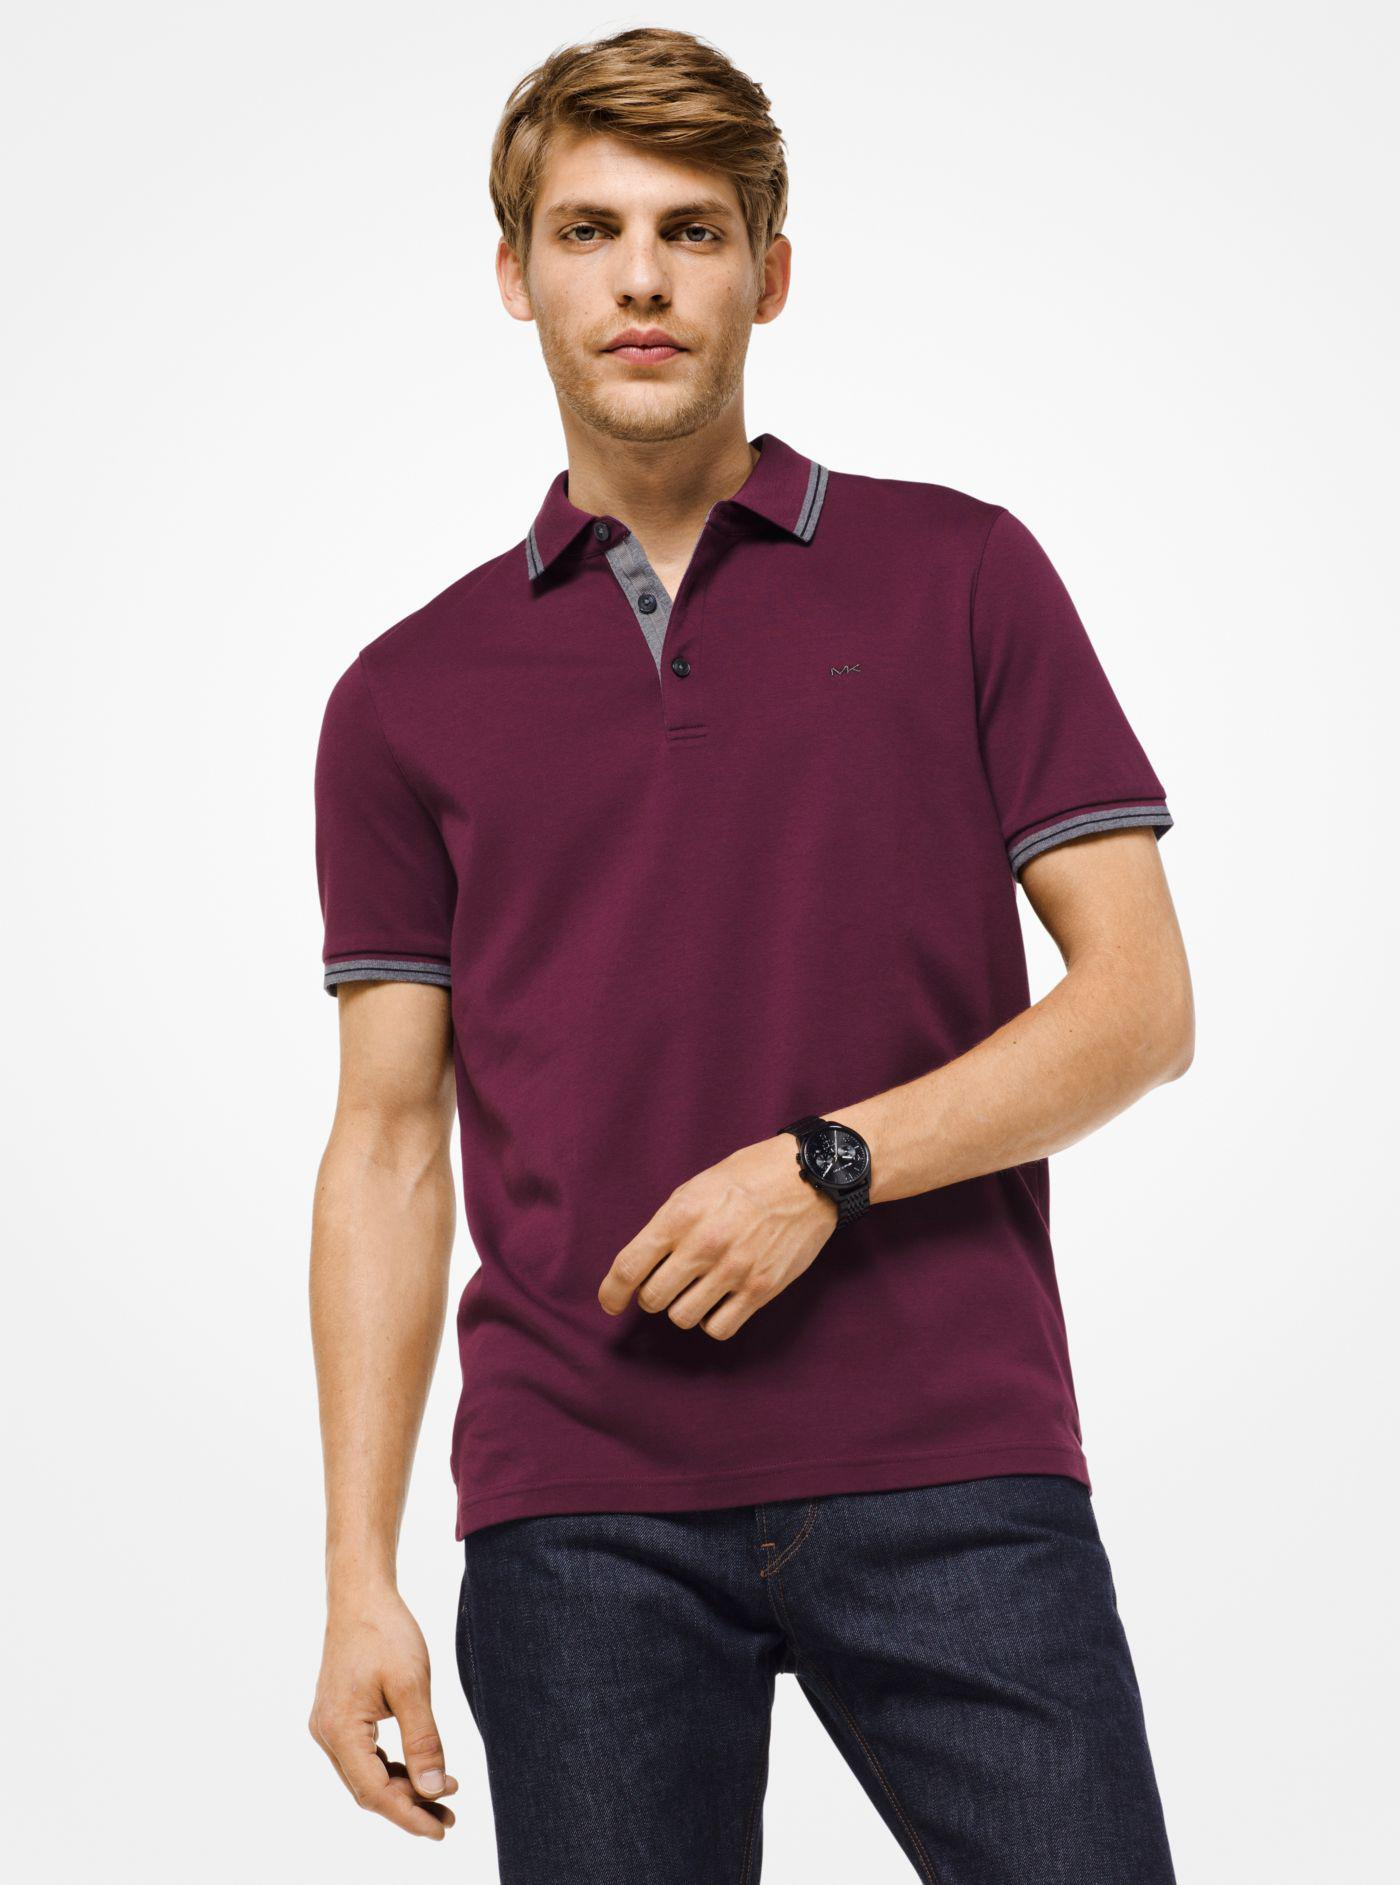 904e5ea88 Michael Kors Greenwich Cotton Polo Shirt in Purple for Men - Lyst